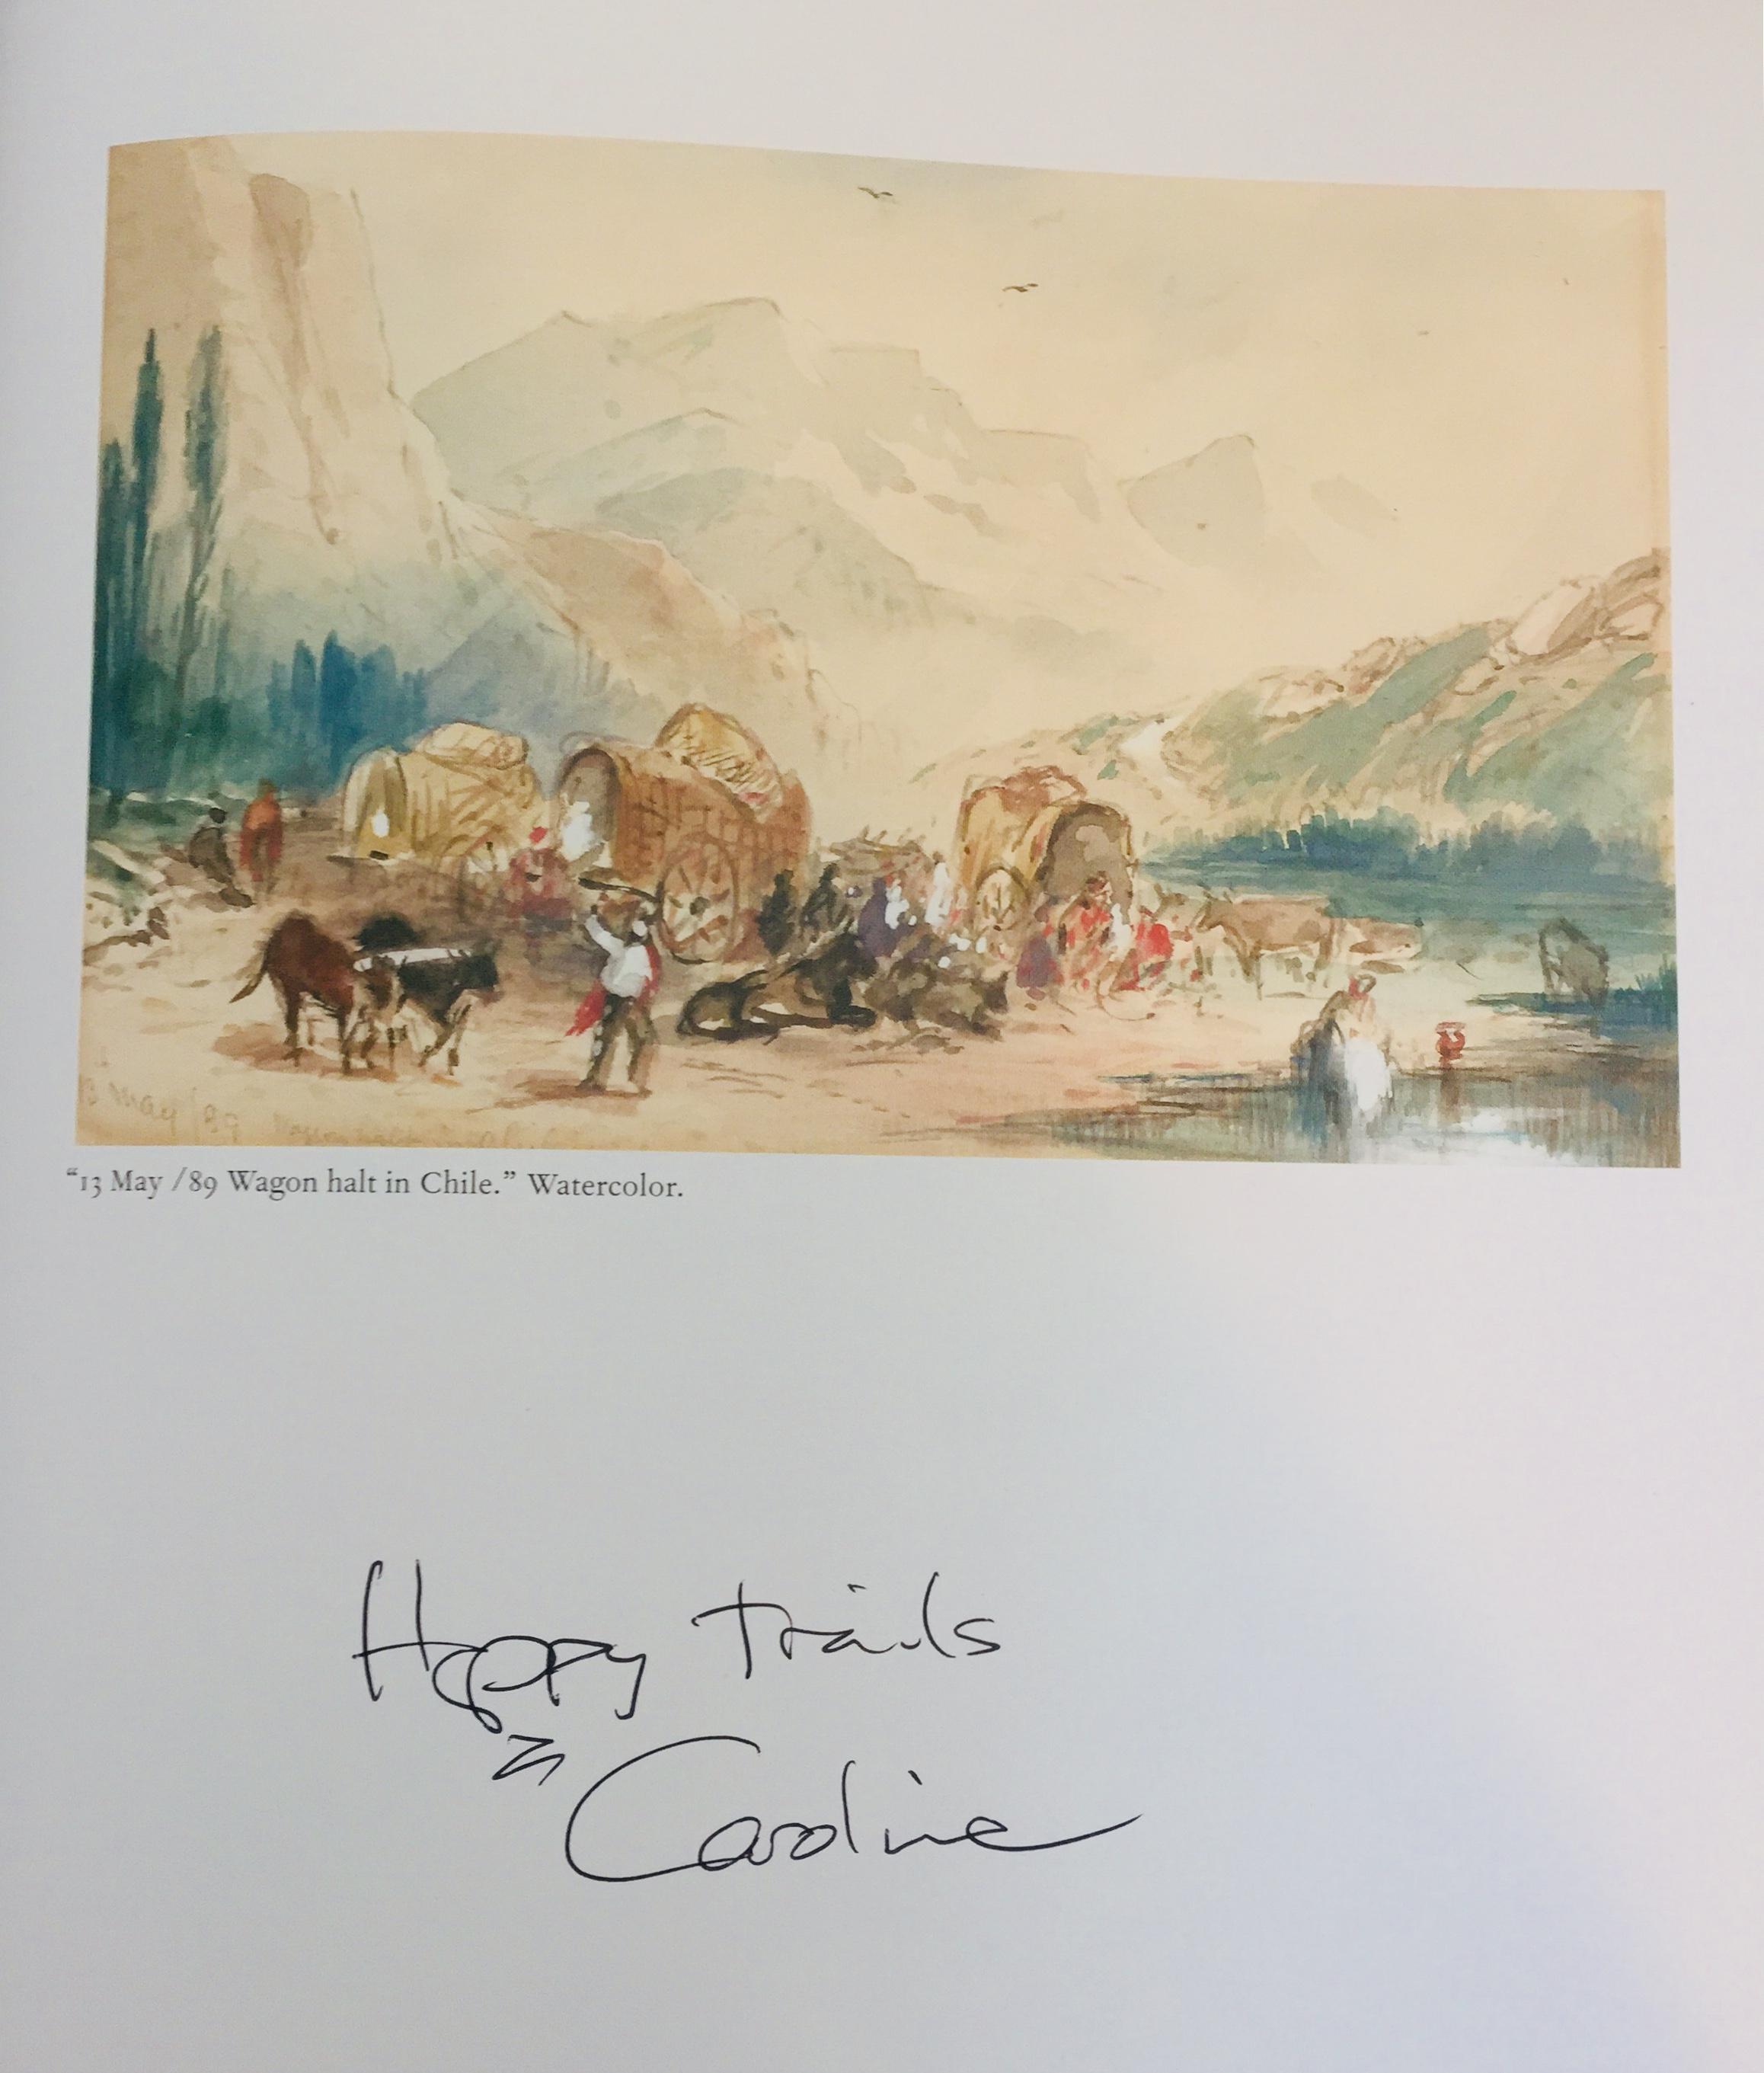 A note from Caroline to Ben | C. Schimmel Catalog | Published by Caroline F. Schimmel,New York, 2017